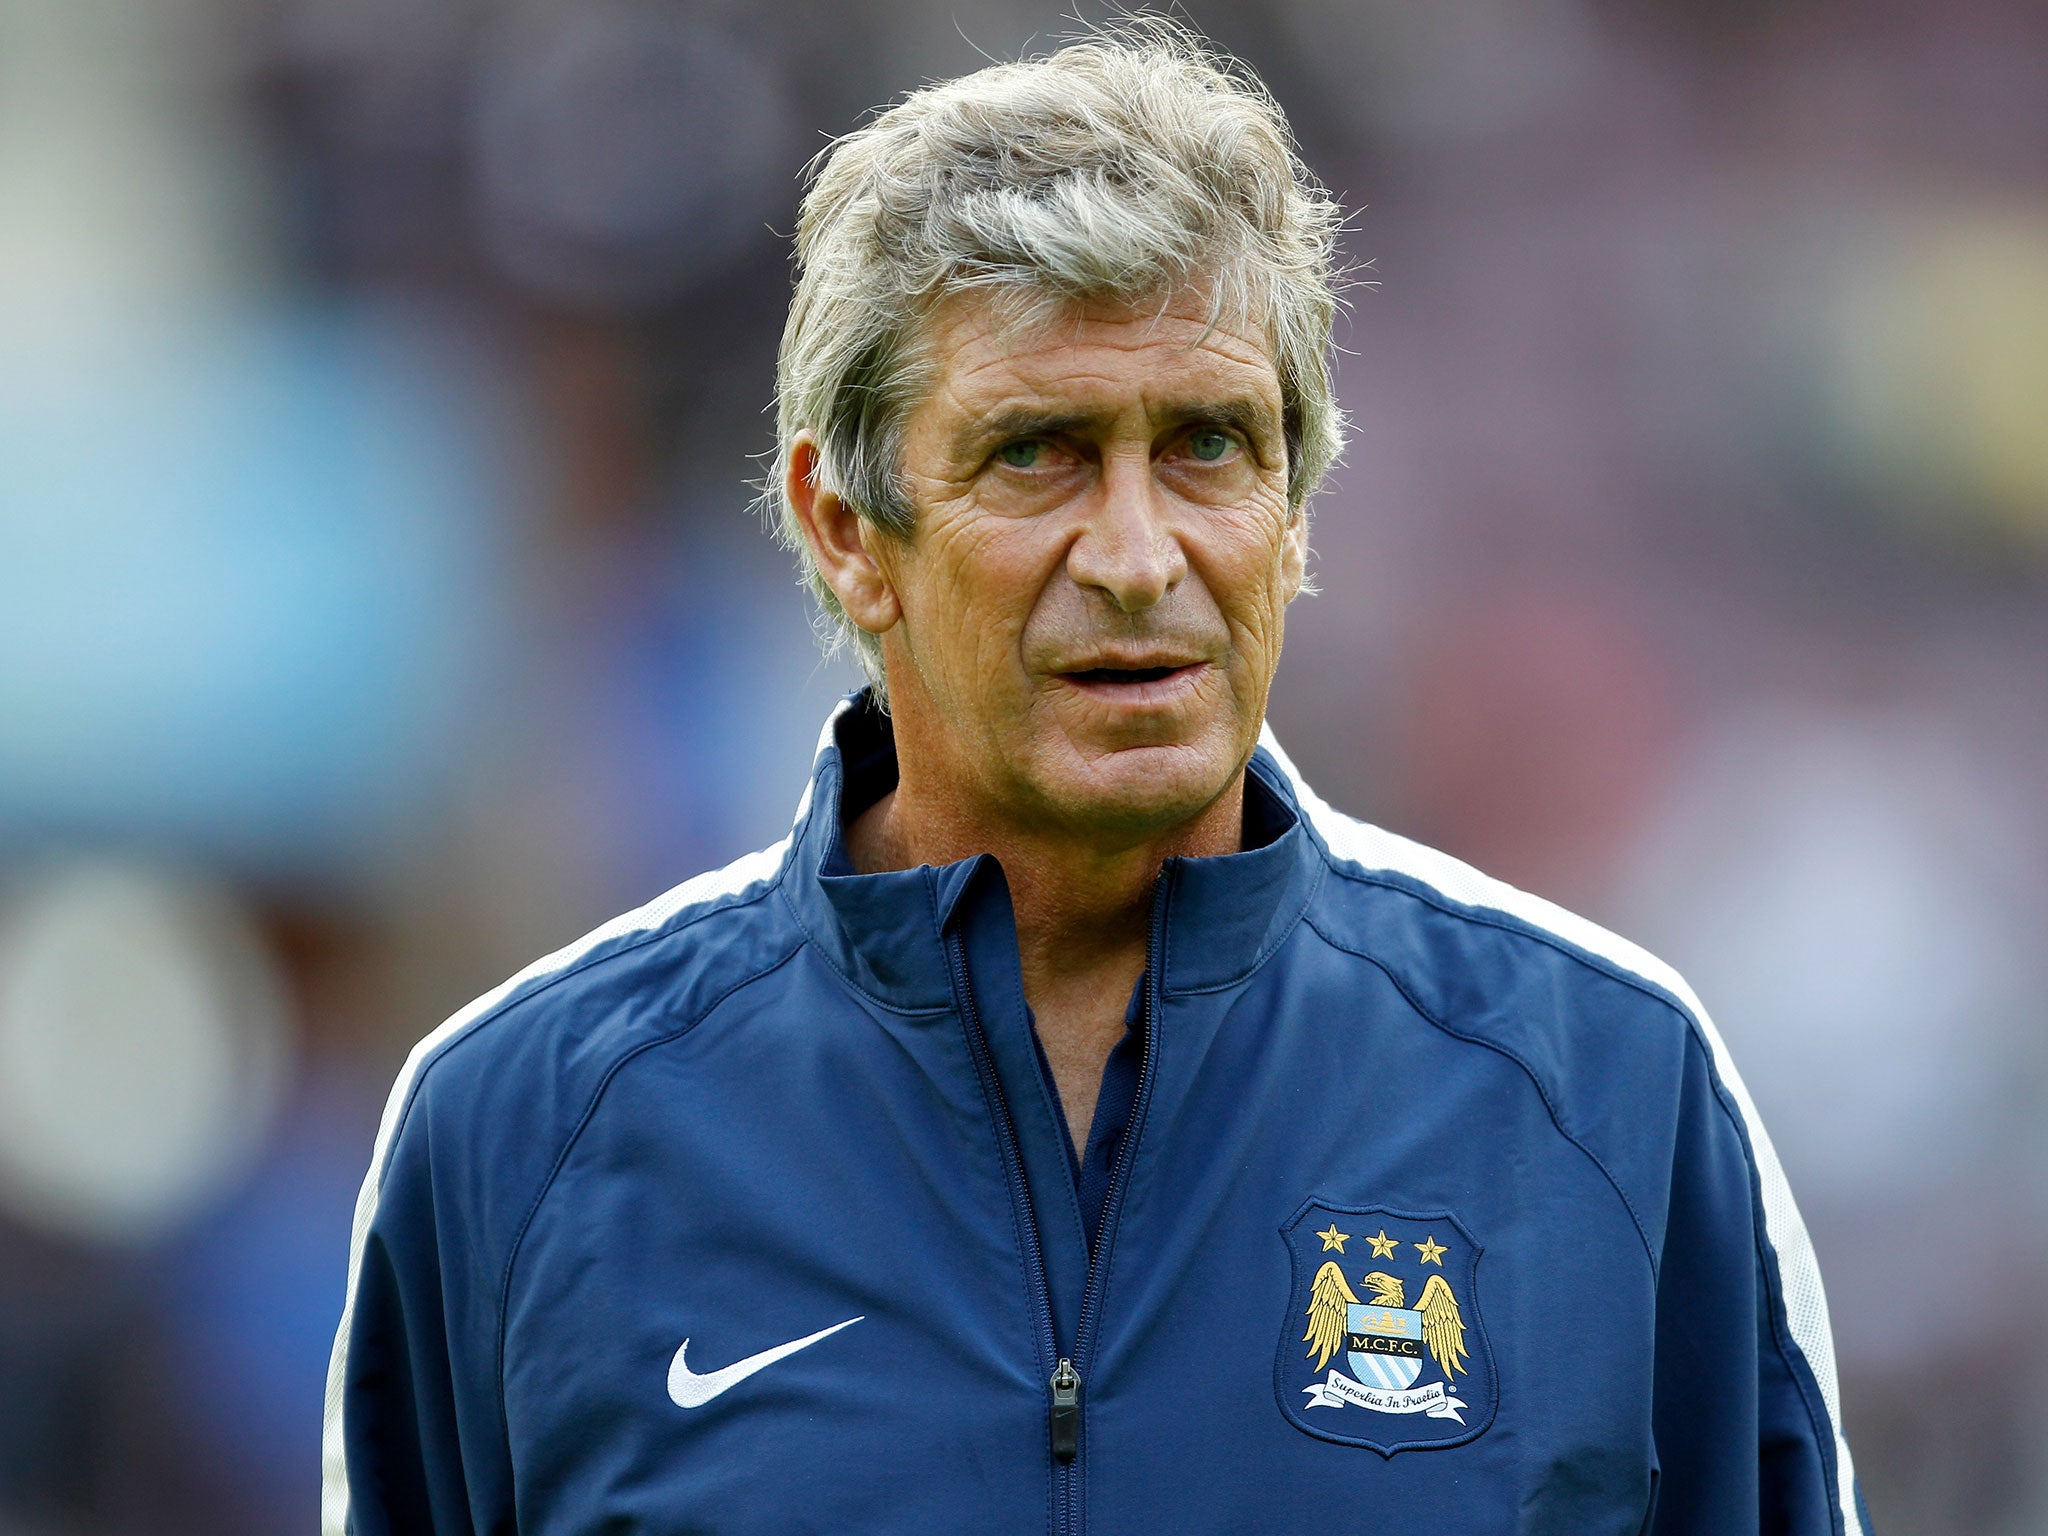 Alvaro Negredo left Manchester City because of Financial Fair Play